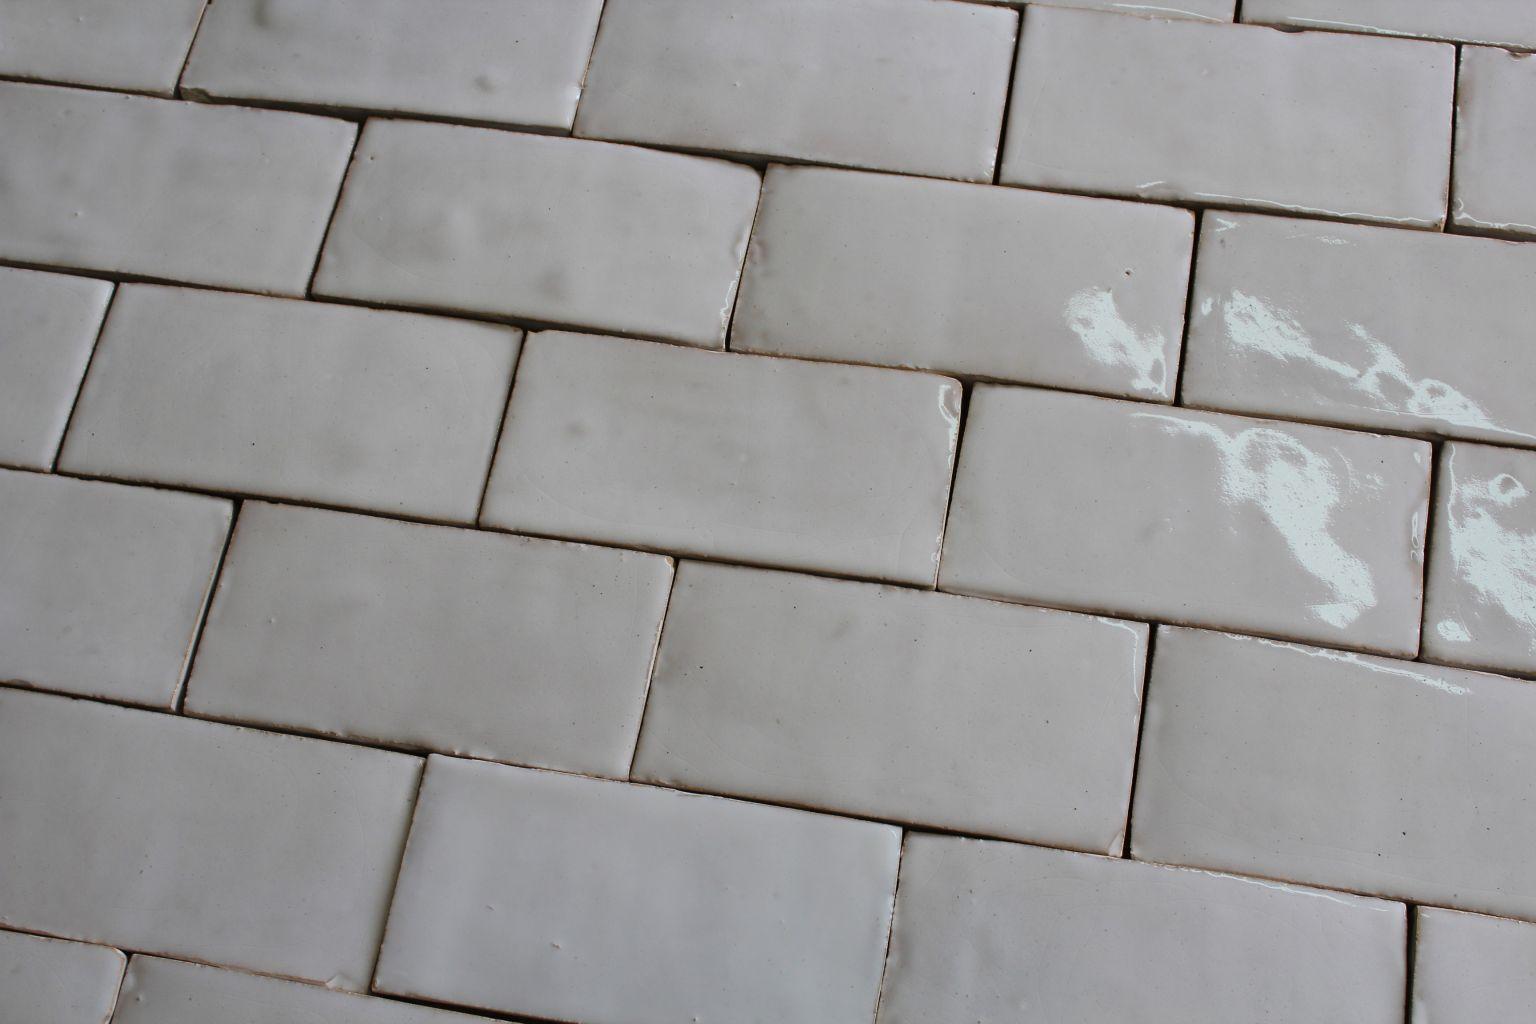 Hand-made white glazed Terra cotta Tiles | BCA Antique Materials